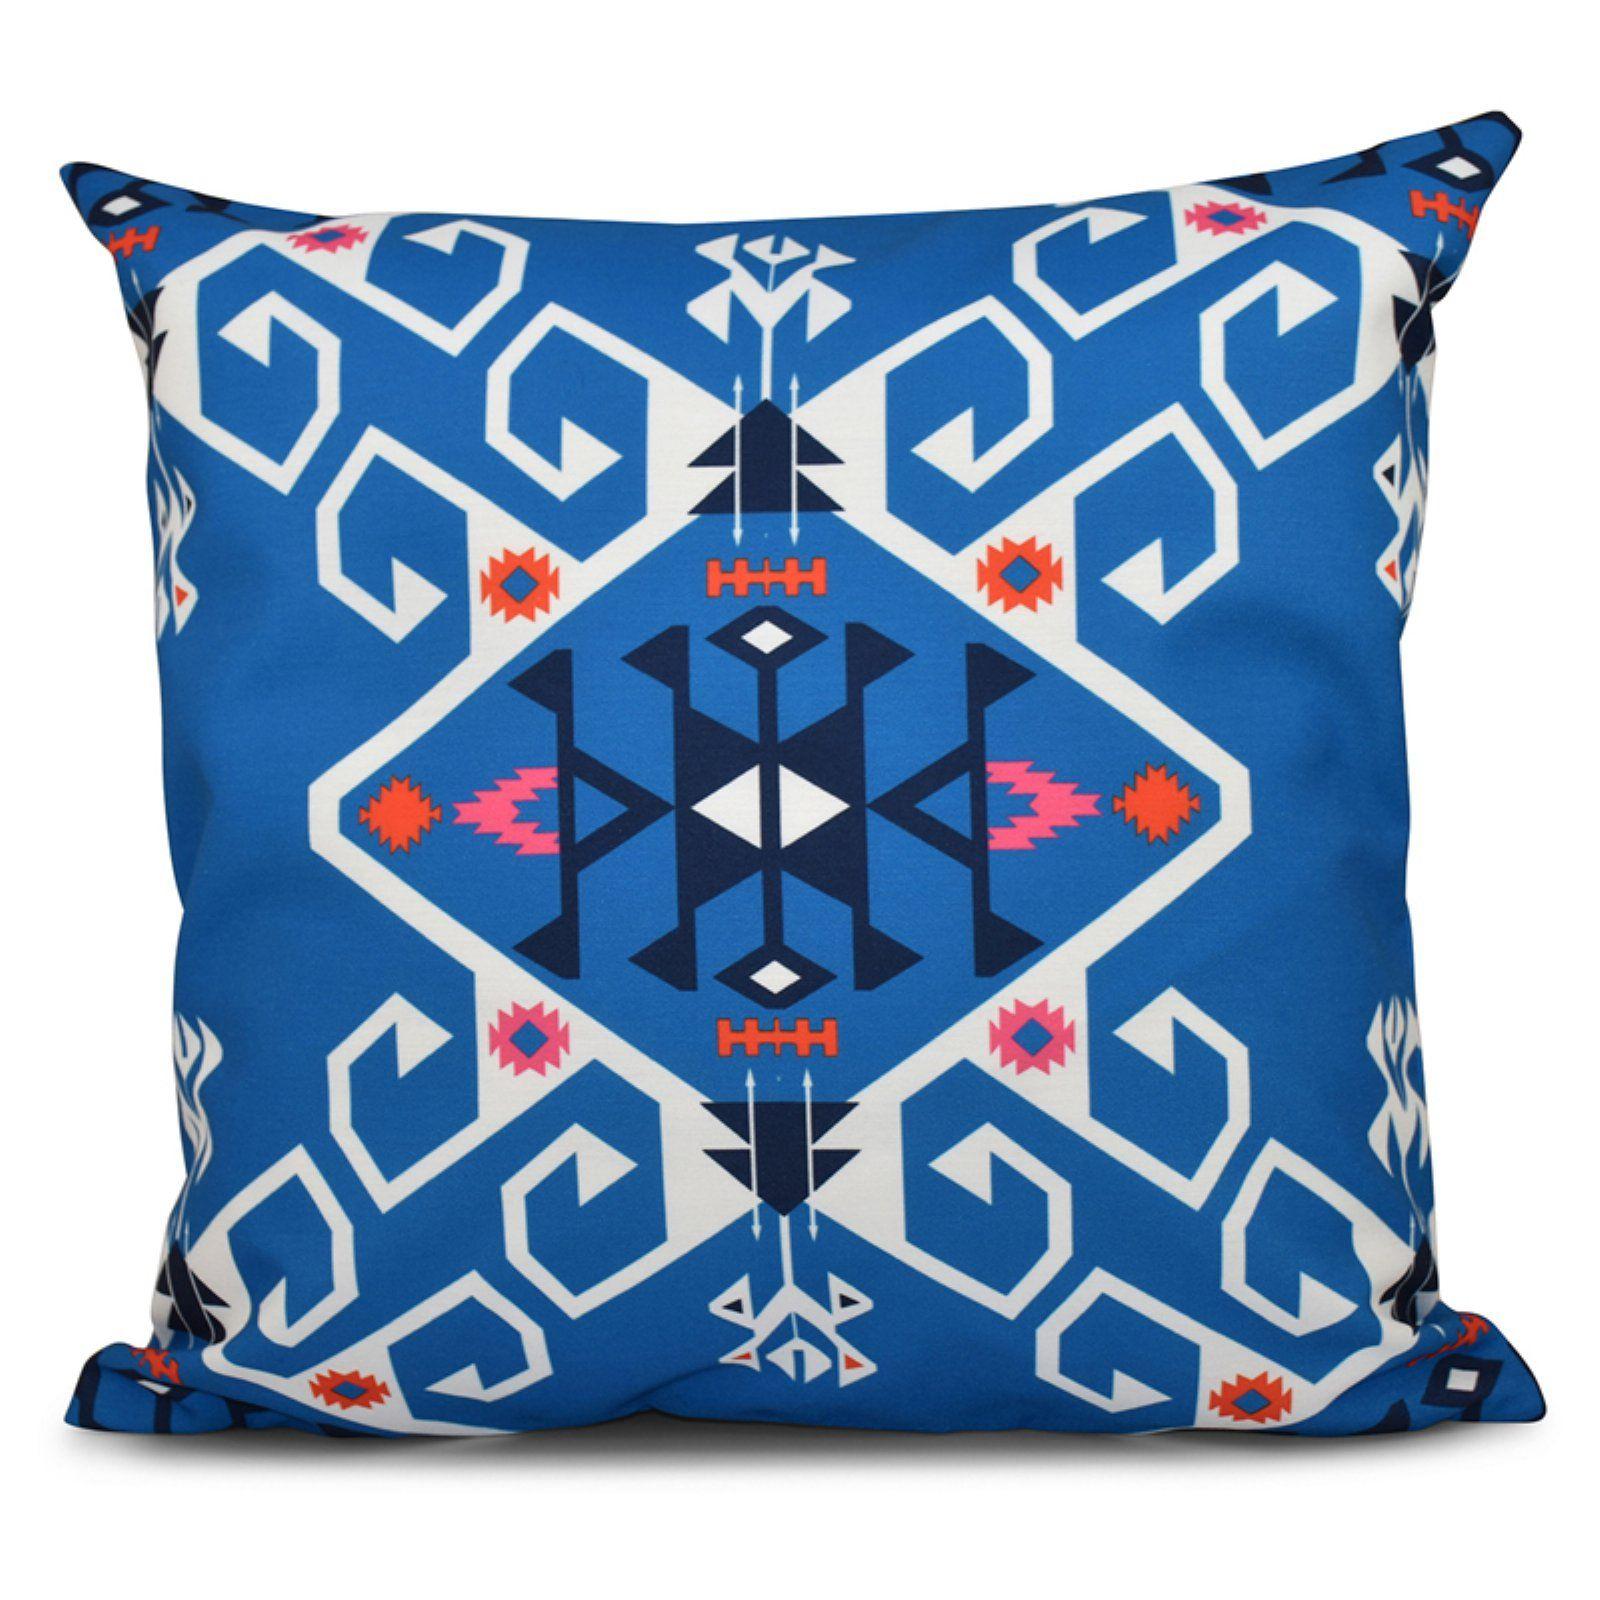 E By Design Happy Hippy Jodhpur Medallion Decorative Pillow Green In